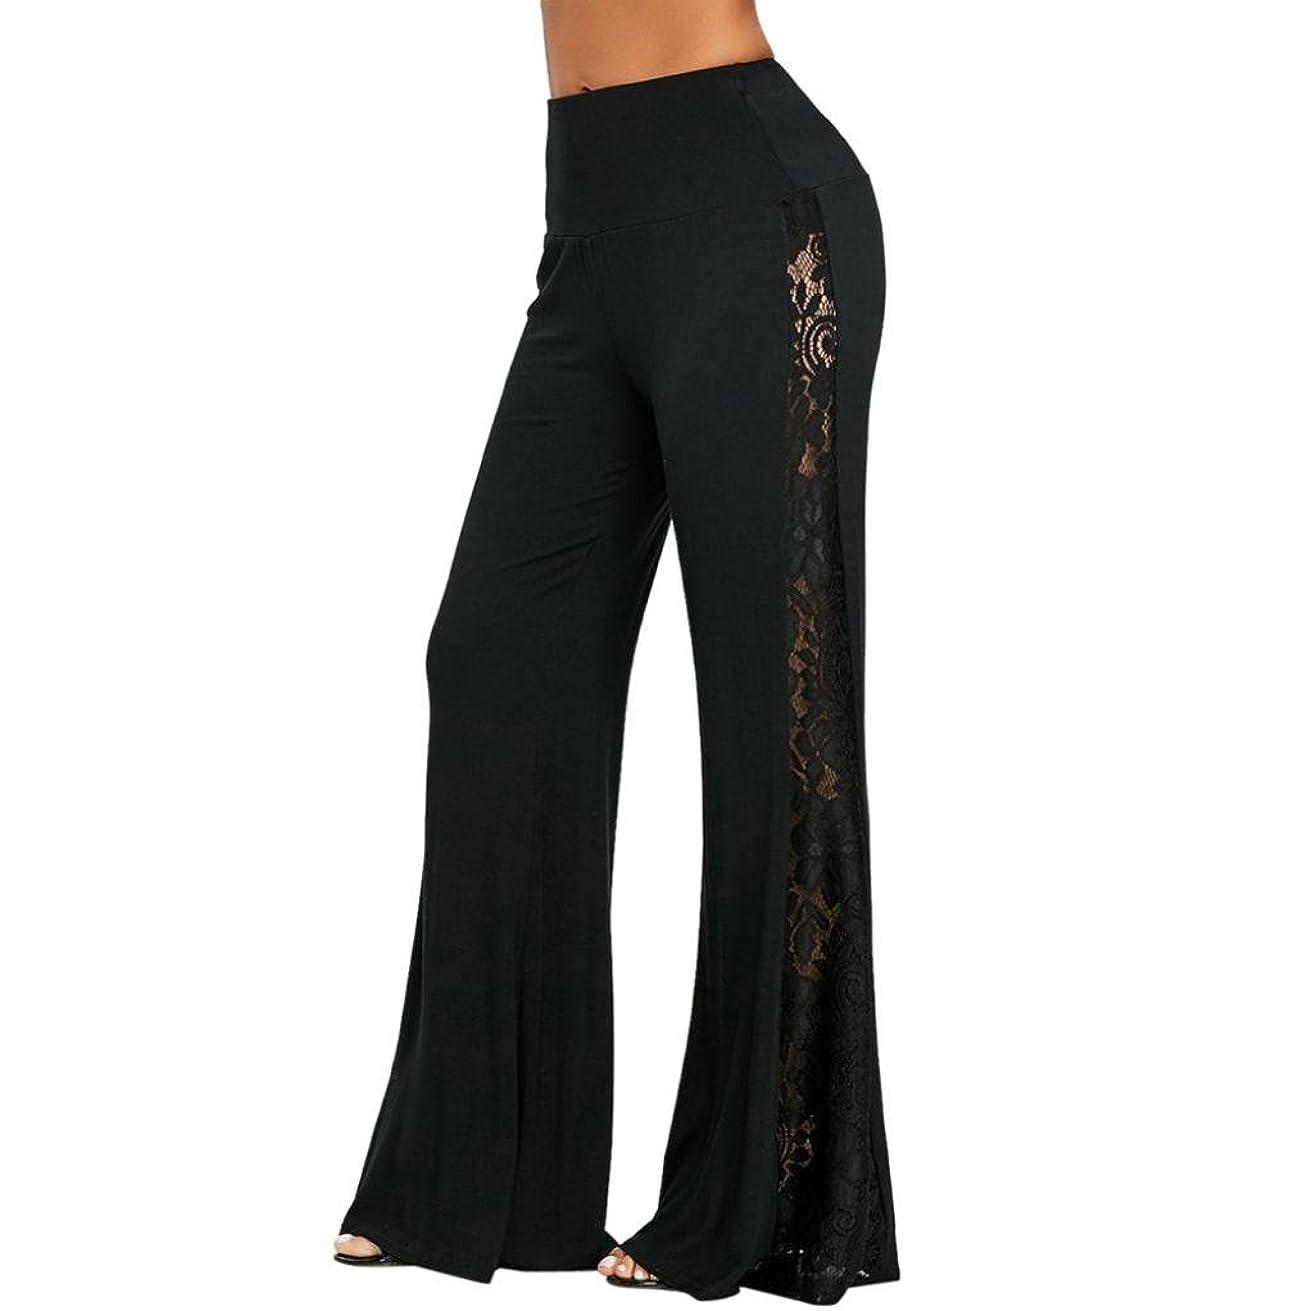 WILLTOO Womens High Waist Wide Leg Pants Loose Leggings Trousers Lace